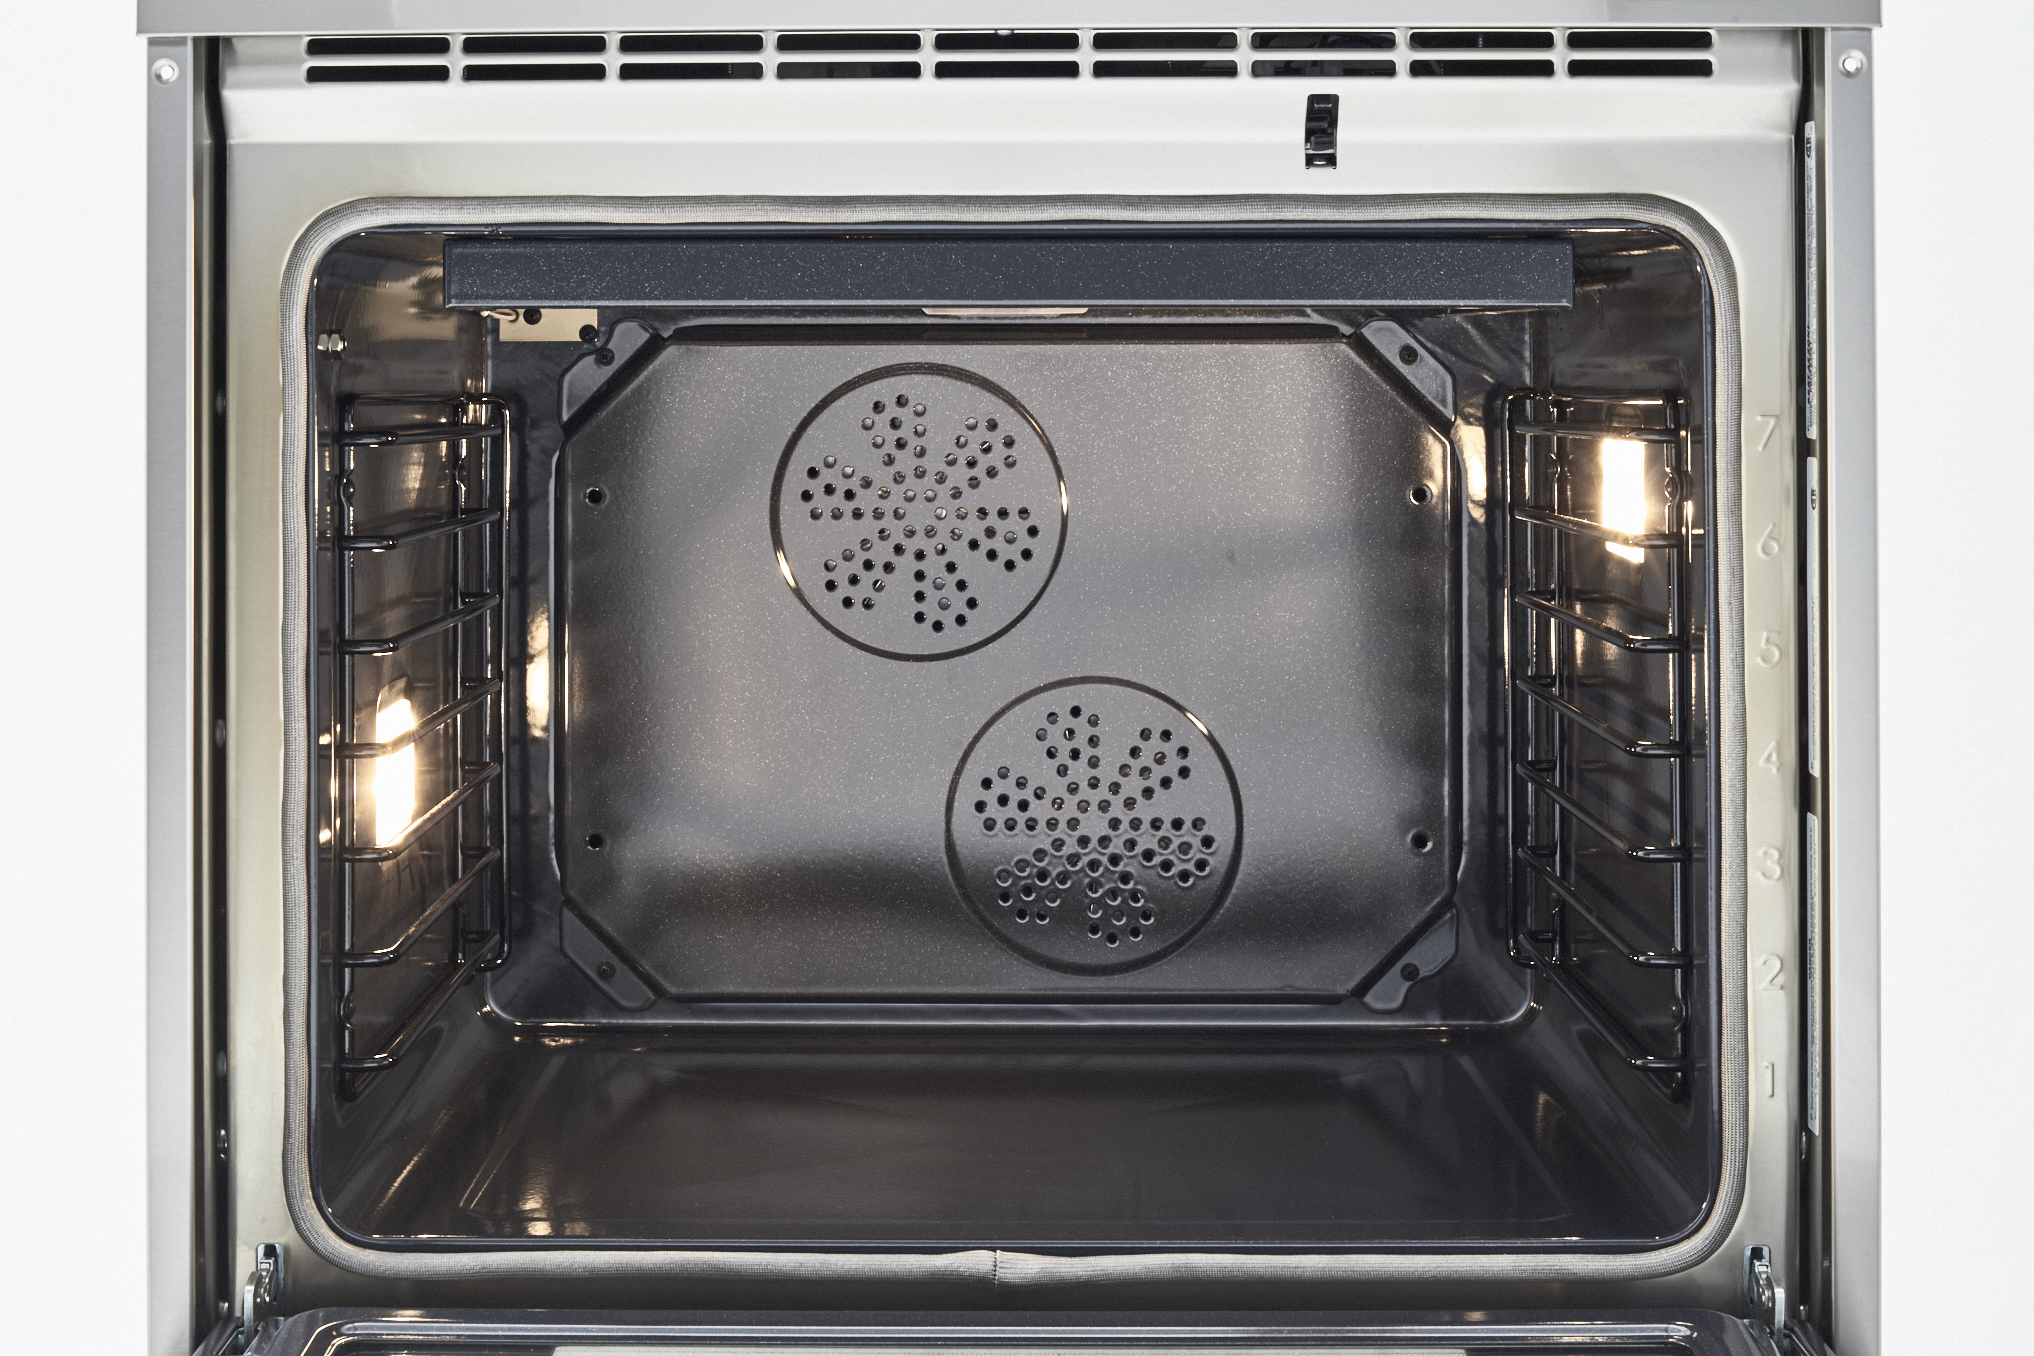 "Model: PROF304INSGIT | Bertazzoni 30"" Professional Series range - Electric self clean oven - 4 induction zones"